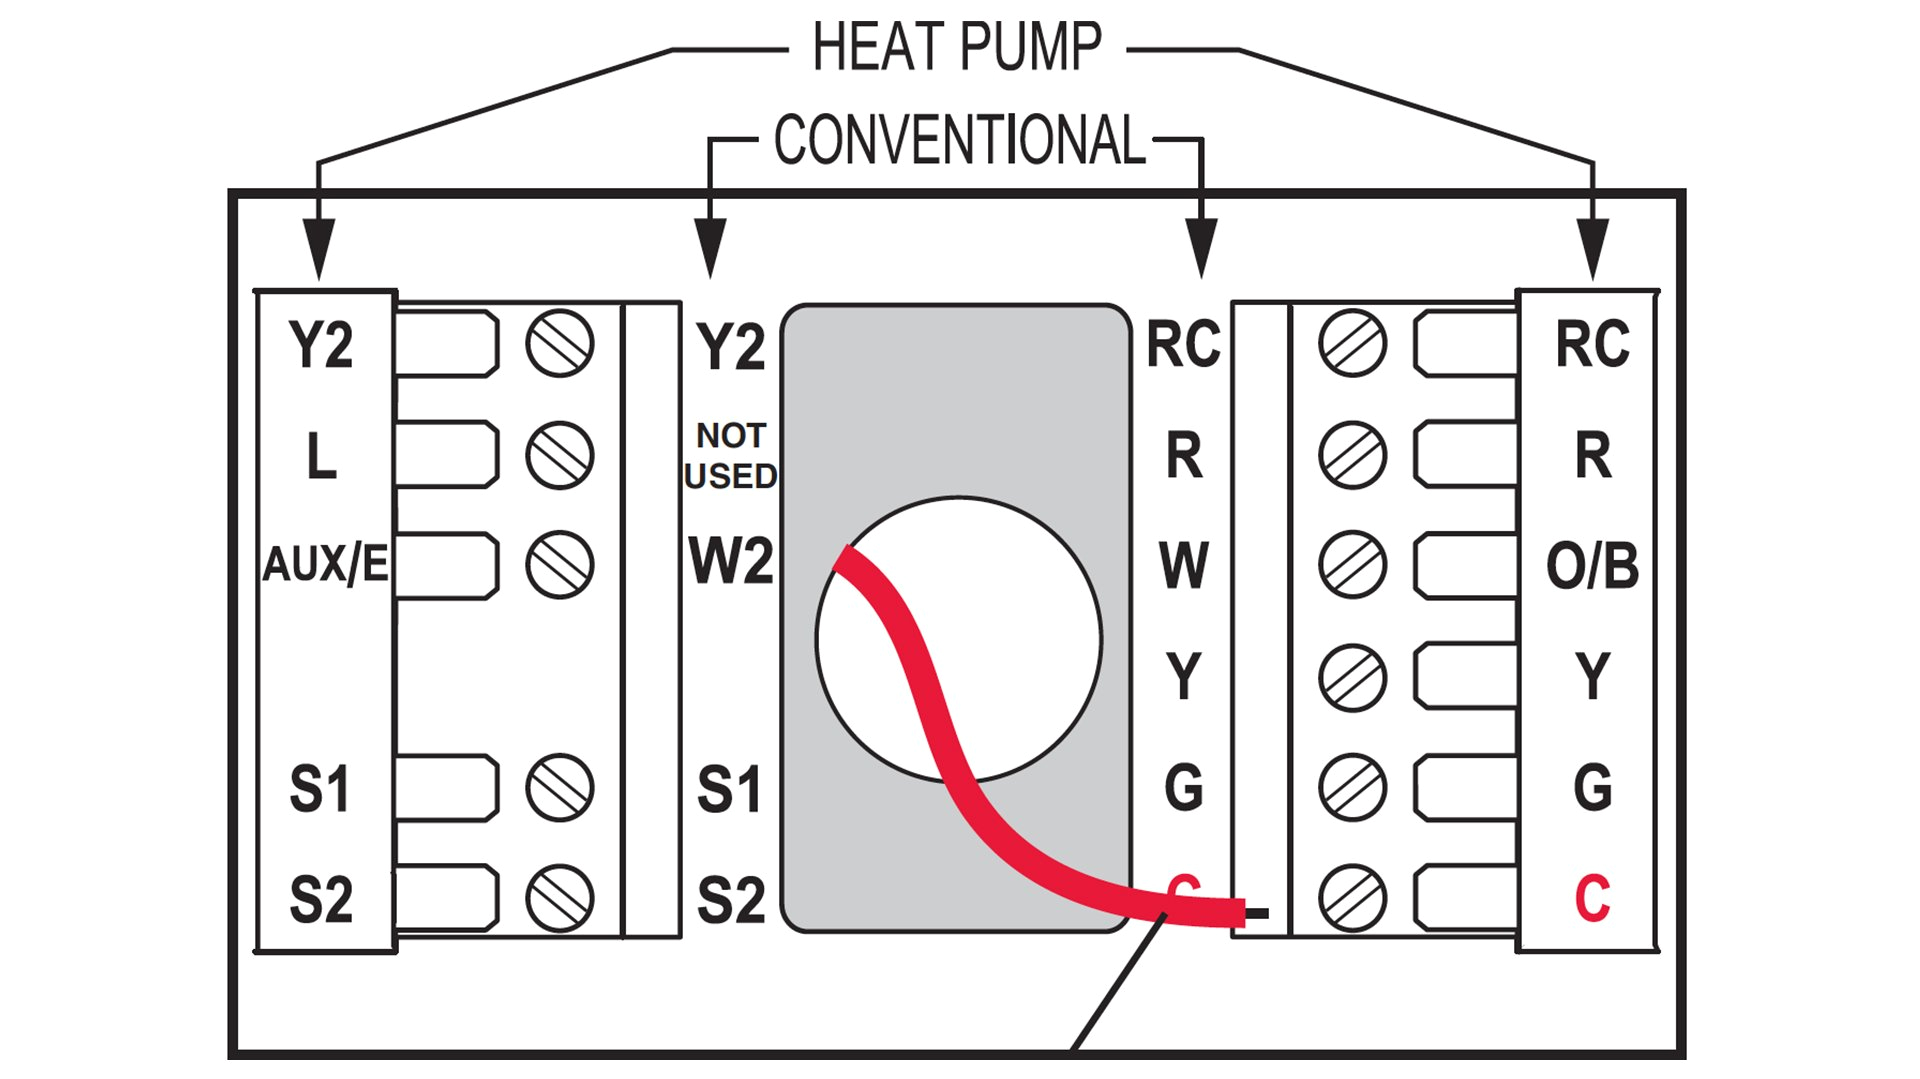 honeywell thermostat wiring instructions diy house help honeywell rth8500d wiring diagram honeywell thermostat wiring diagram